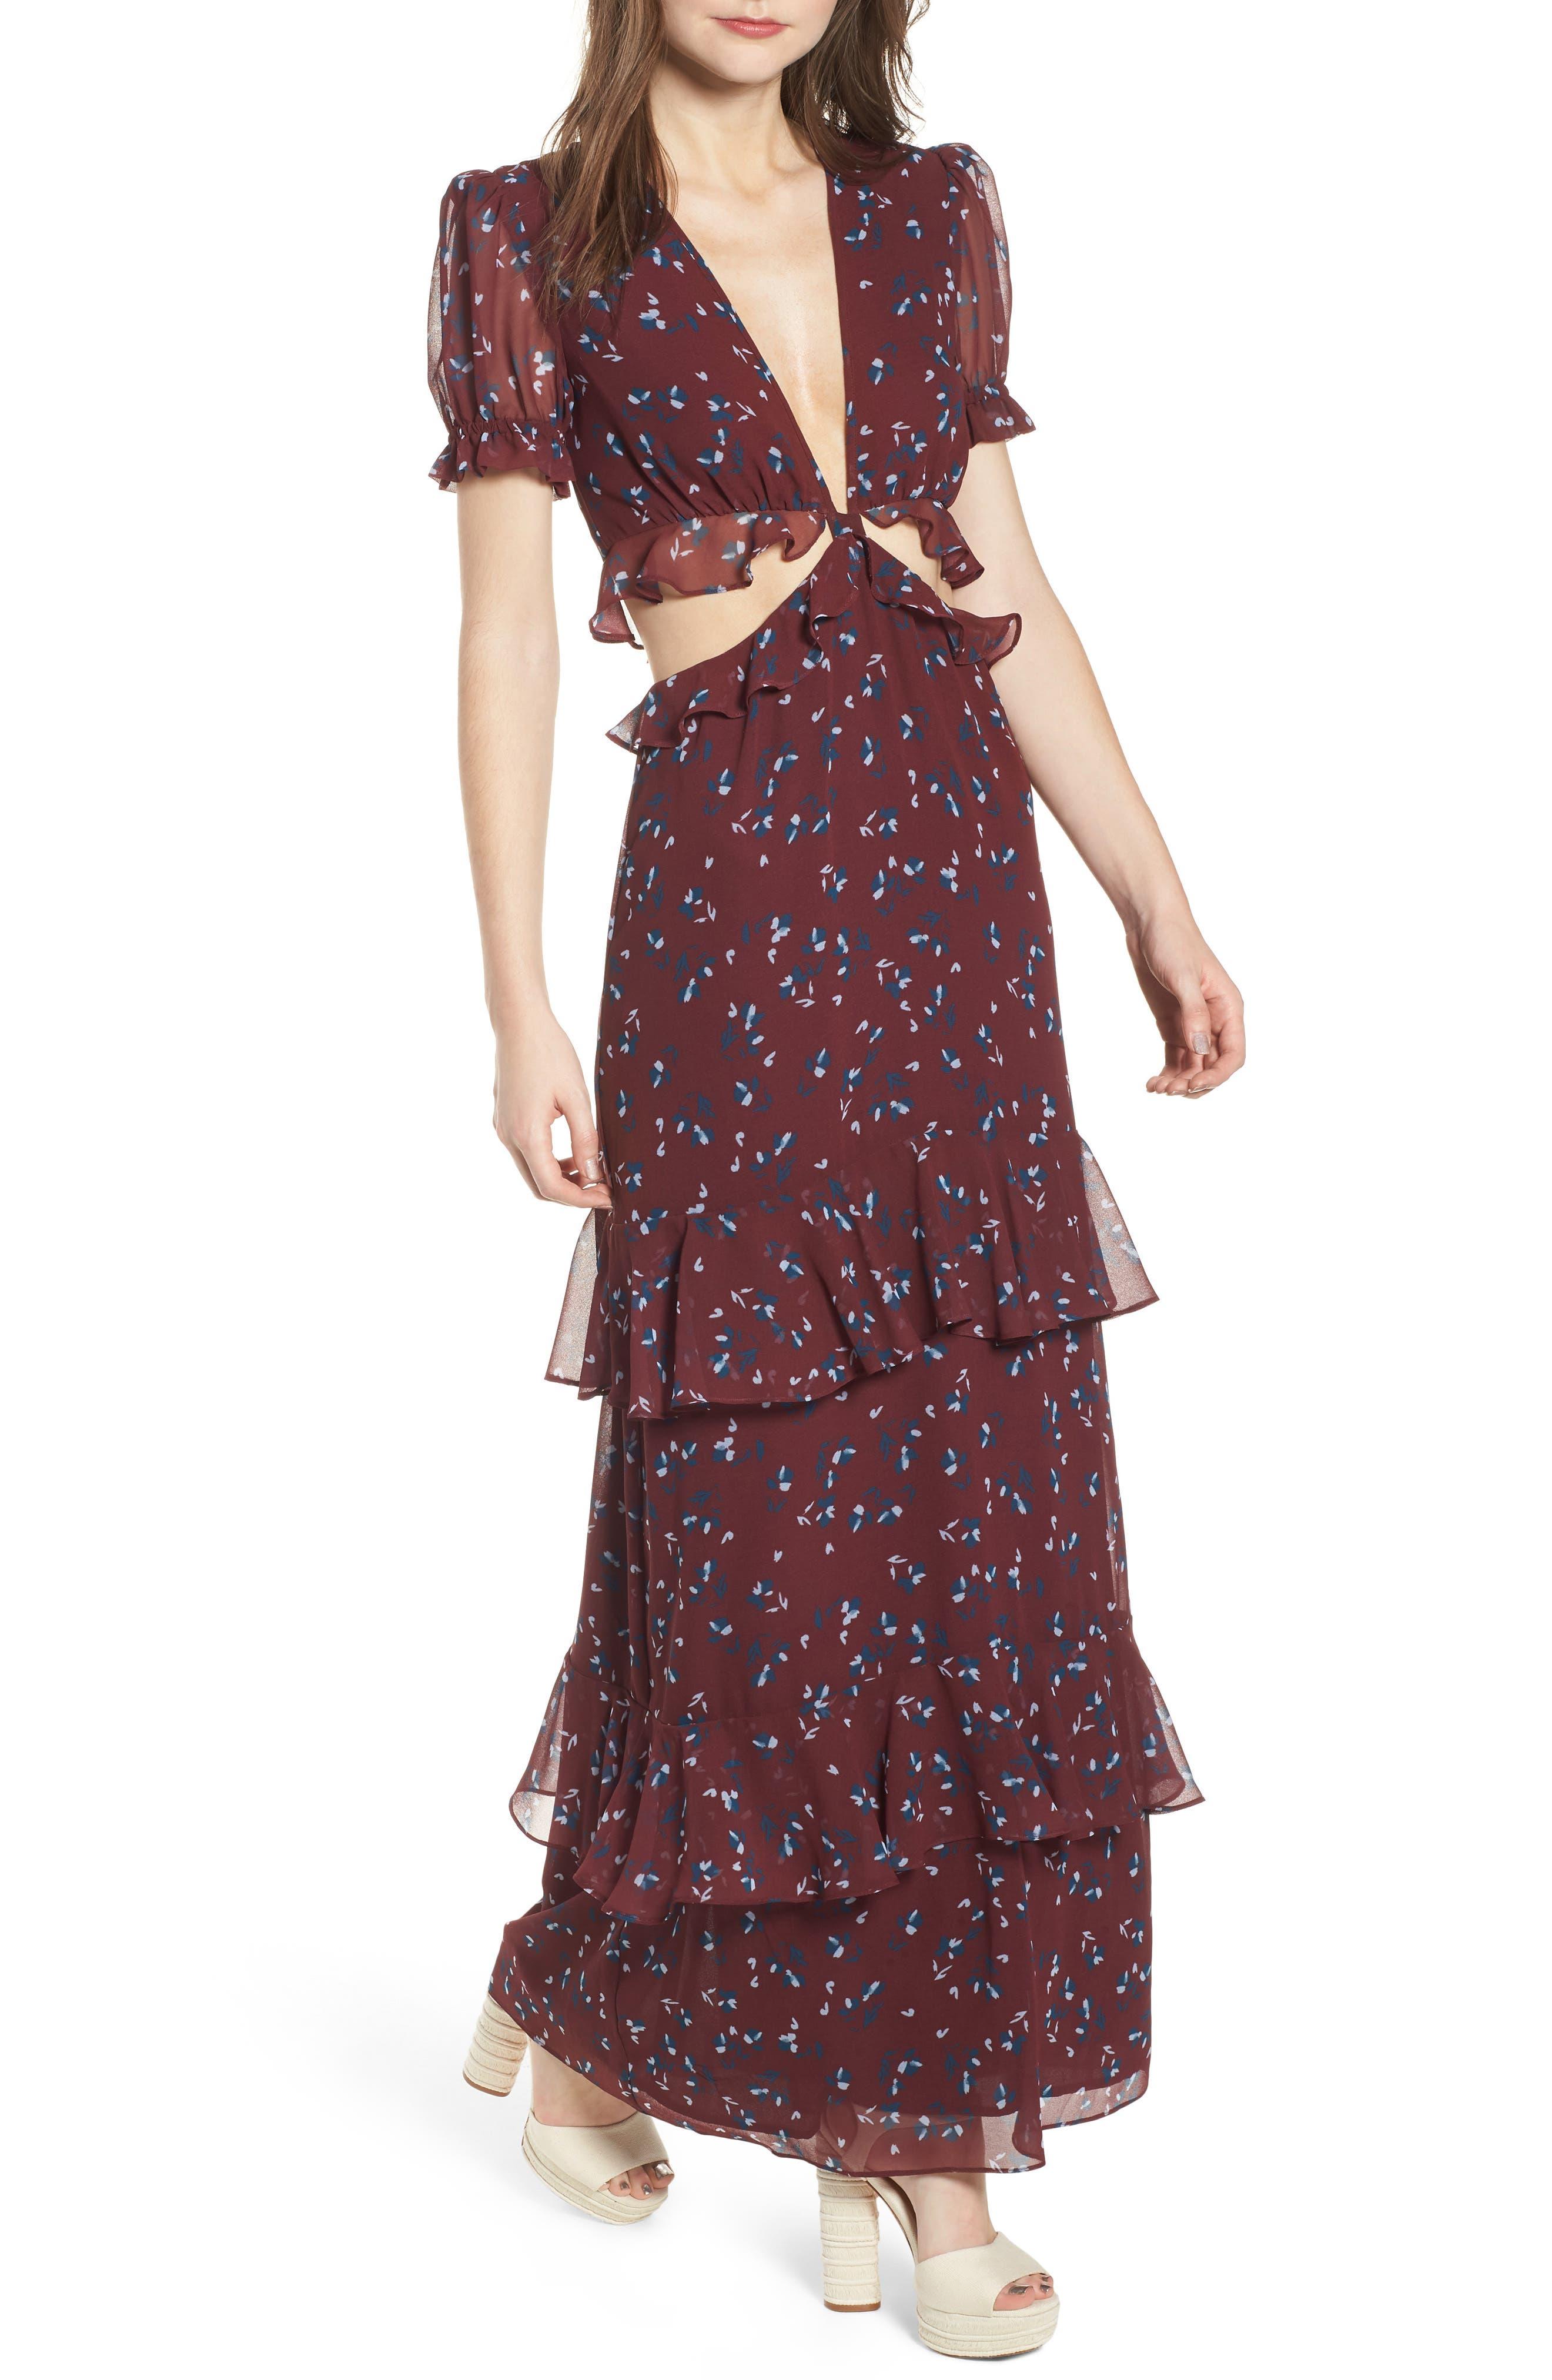 Laviana Maxi Dress,                             Main thumbnail 1, color,                             930